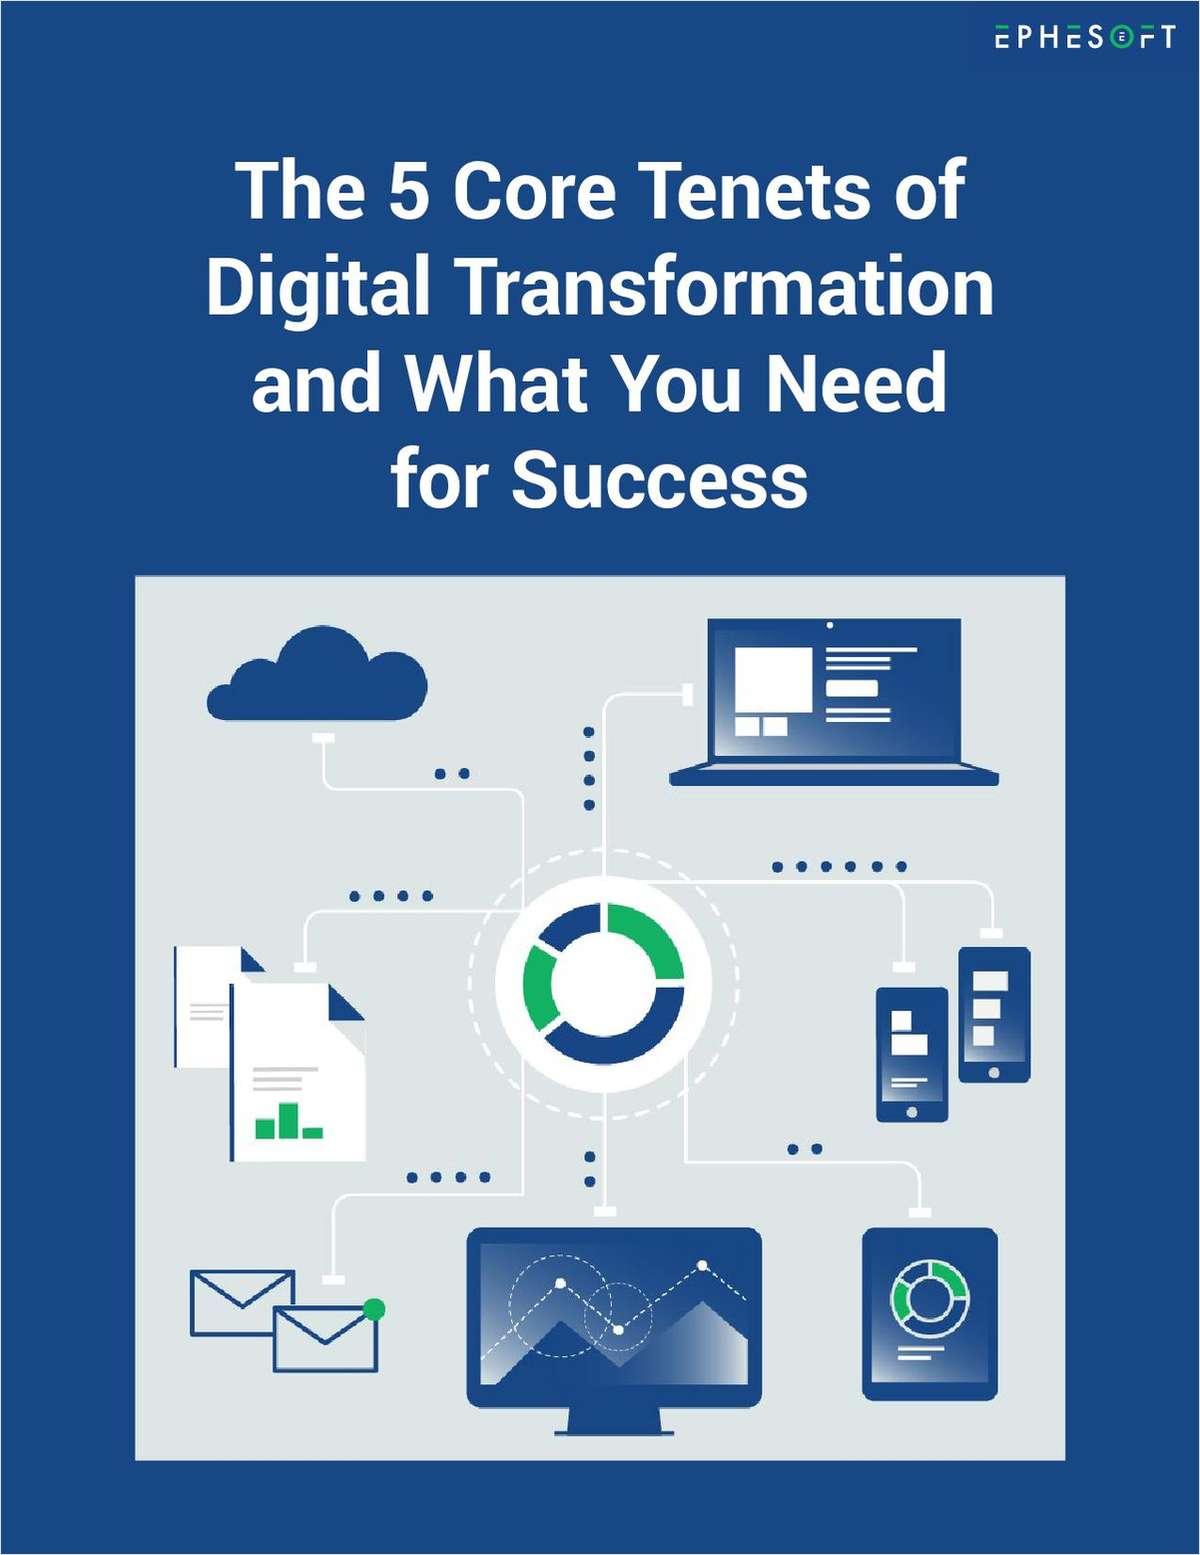 5 Core Tenets of Digital Transformation